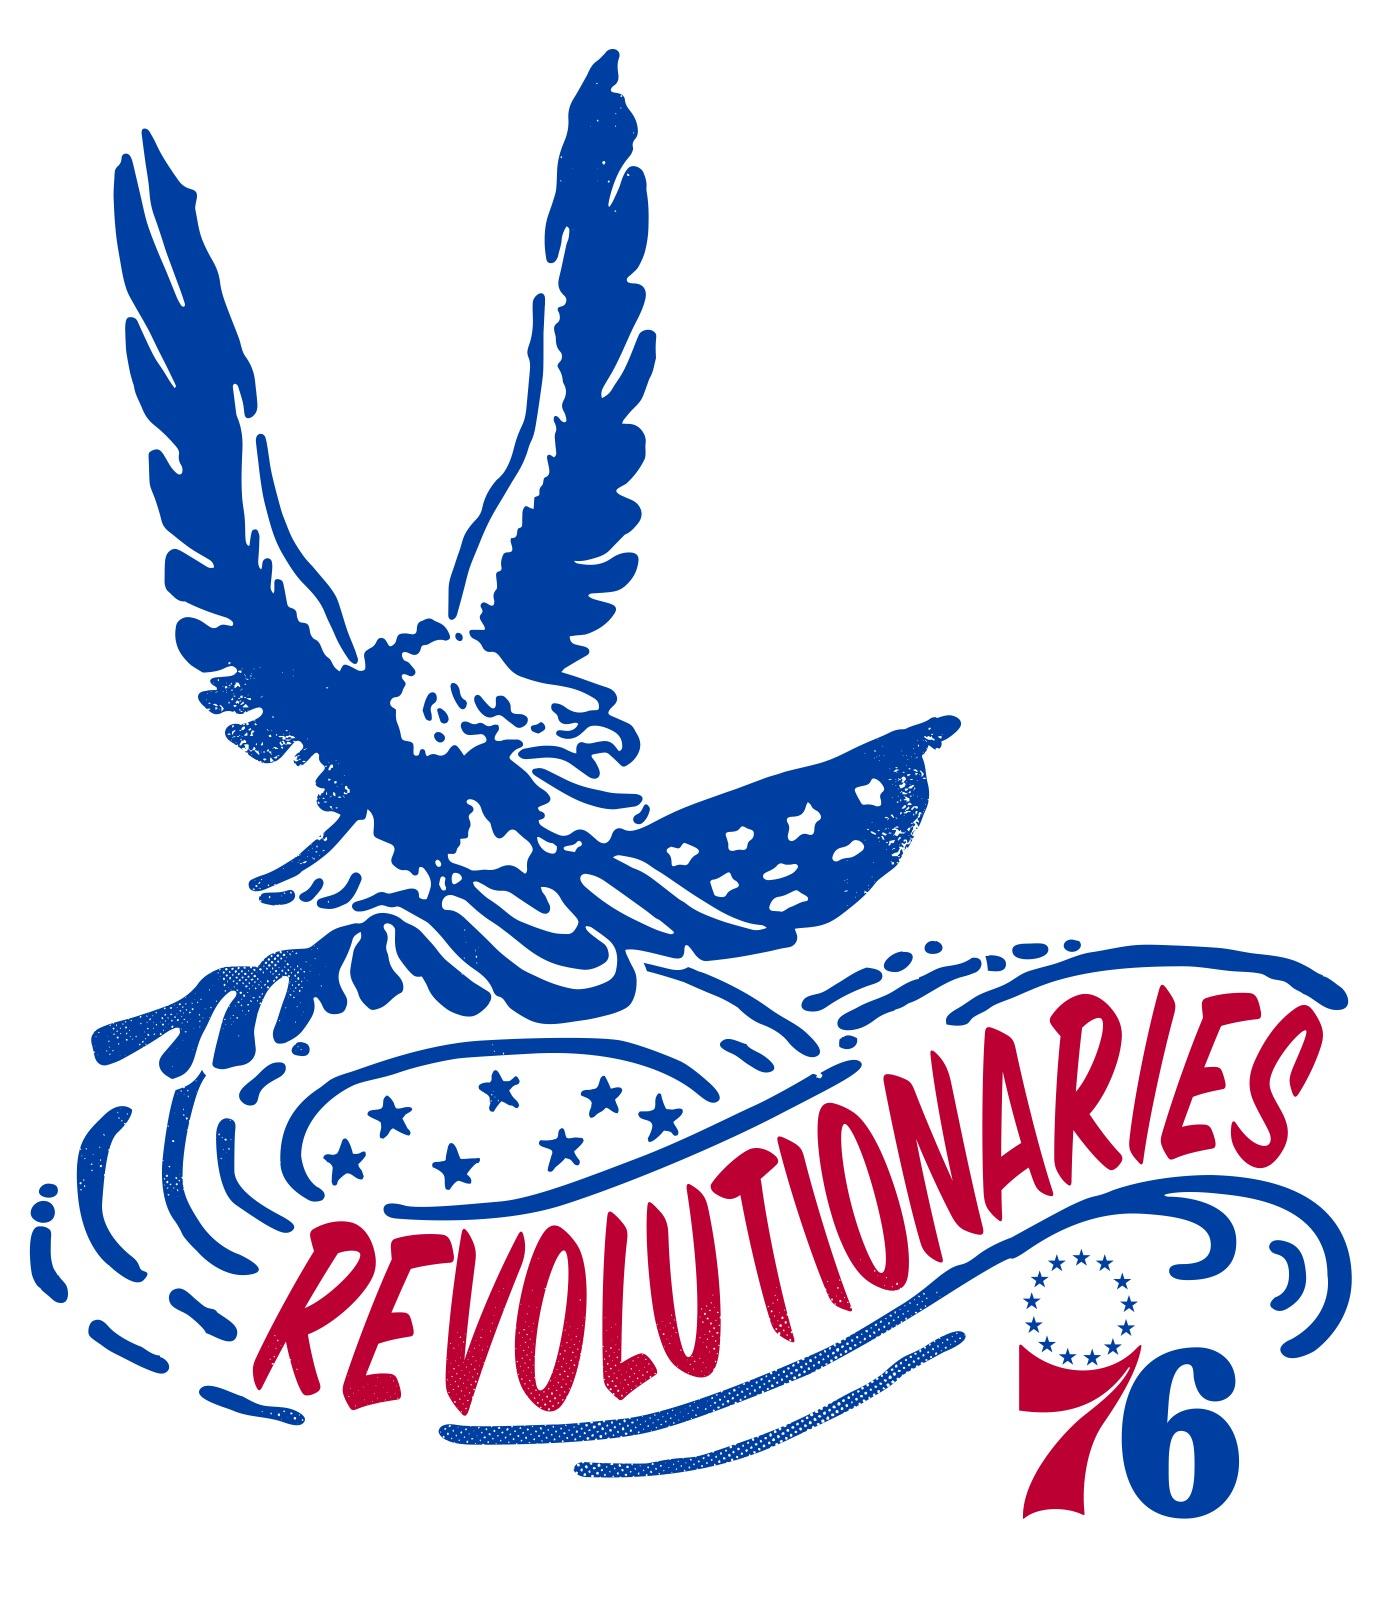 Sixers_Revolutionaries_Logos_RD 1[2] copy.jpg